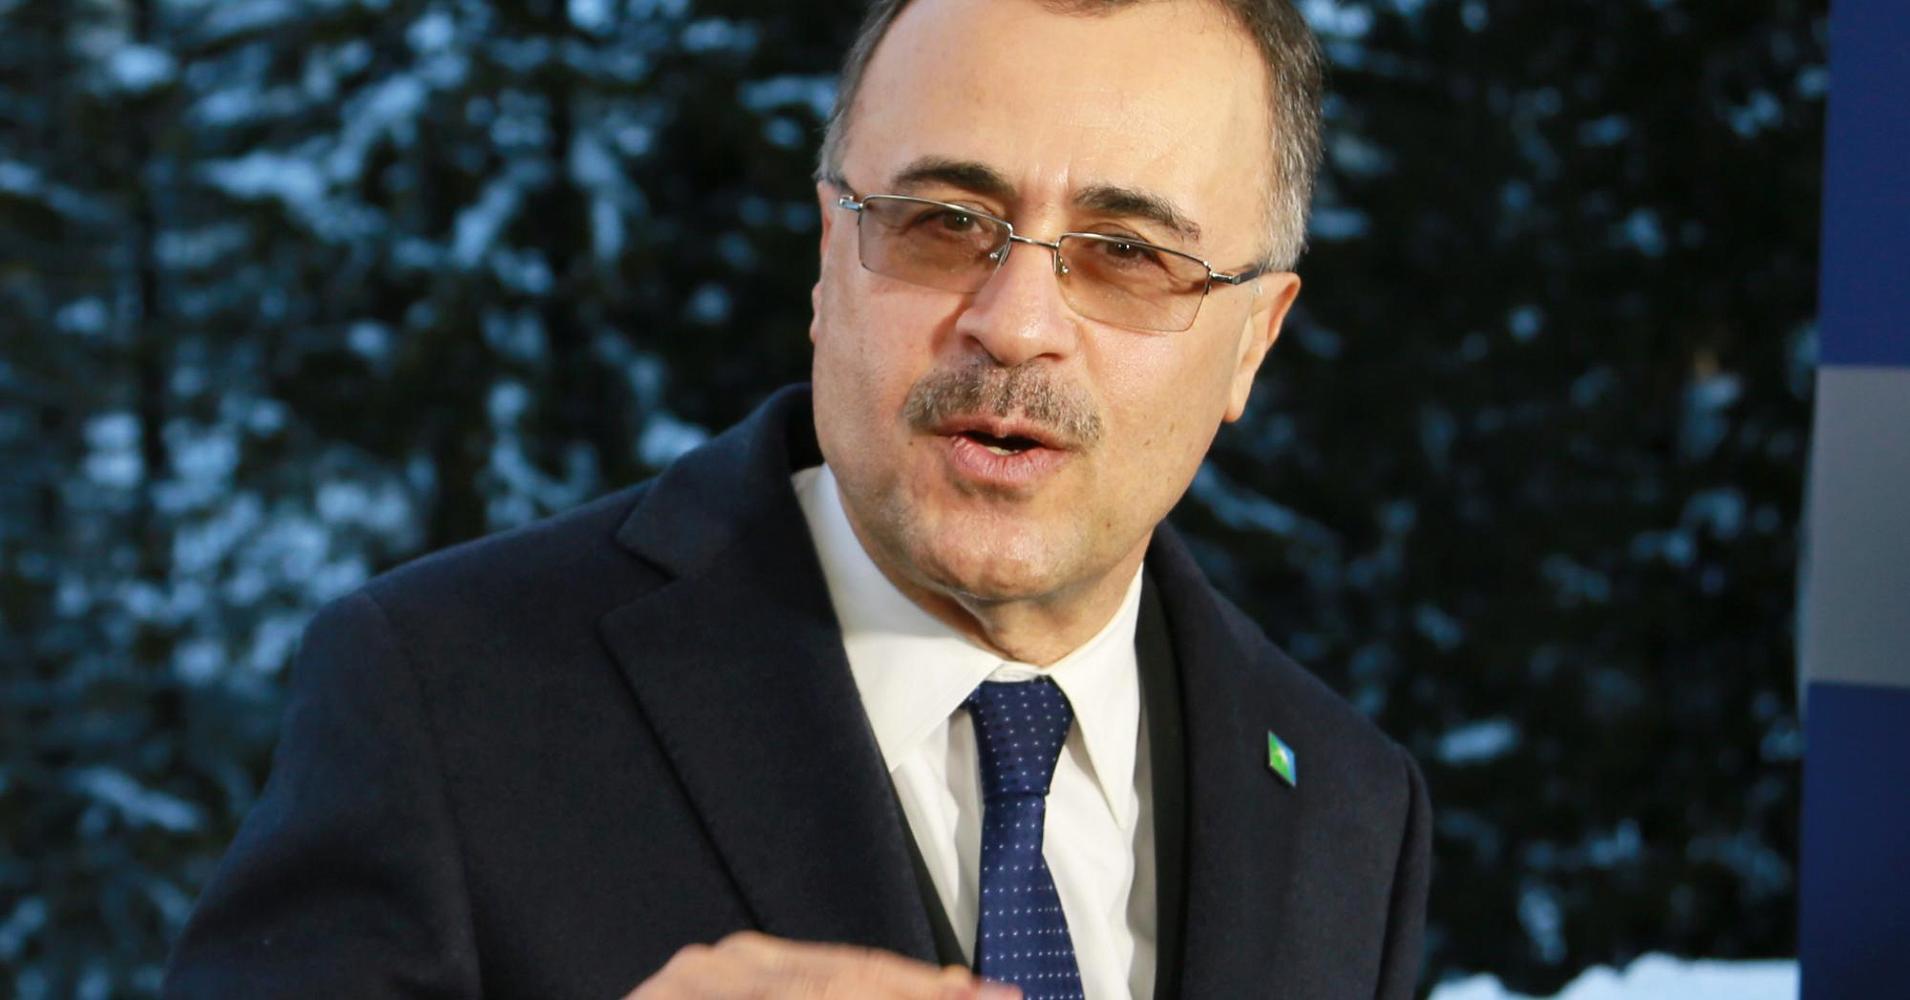 Amin Nasser, CEO, Saudi Aramco. Source: Katie Kramer/CNBC.